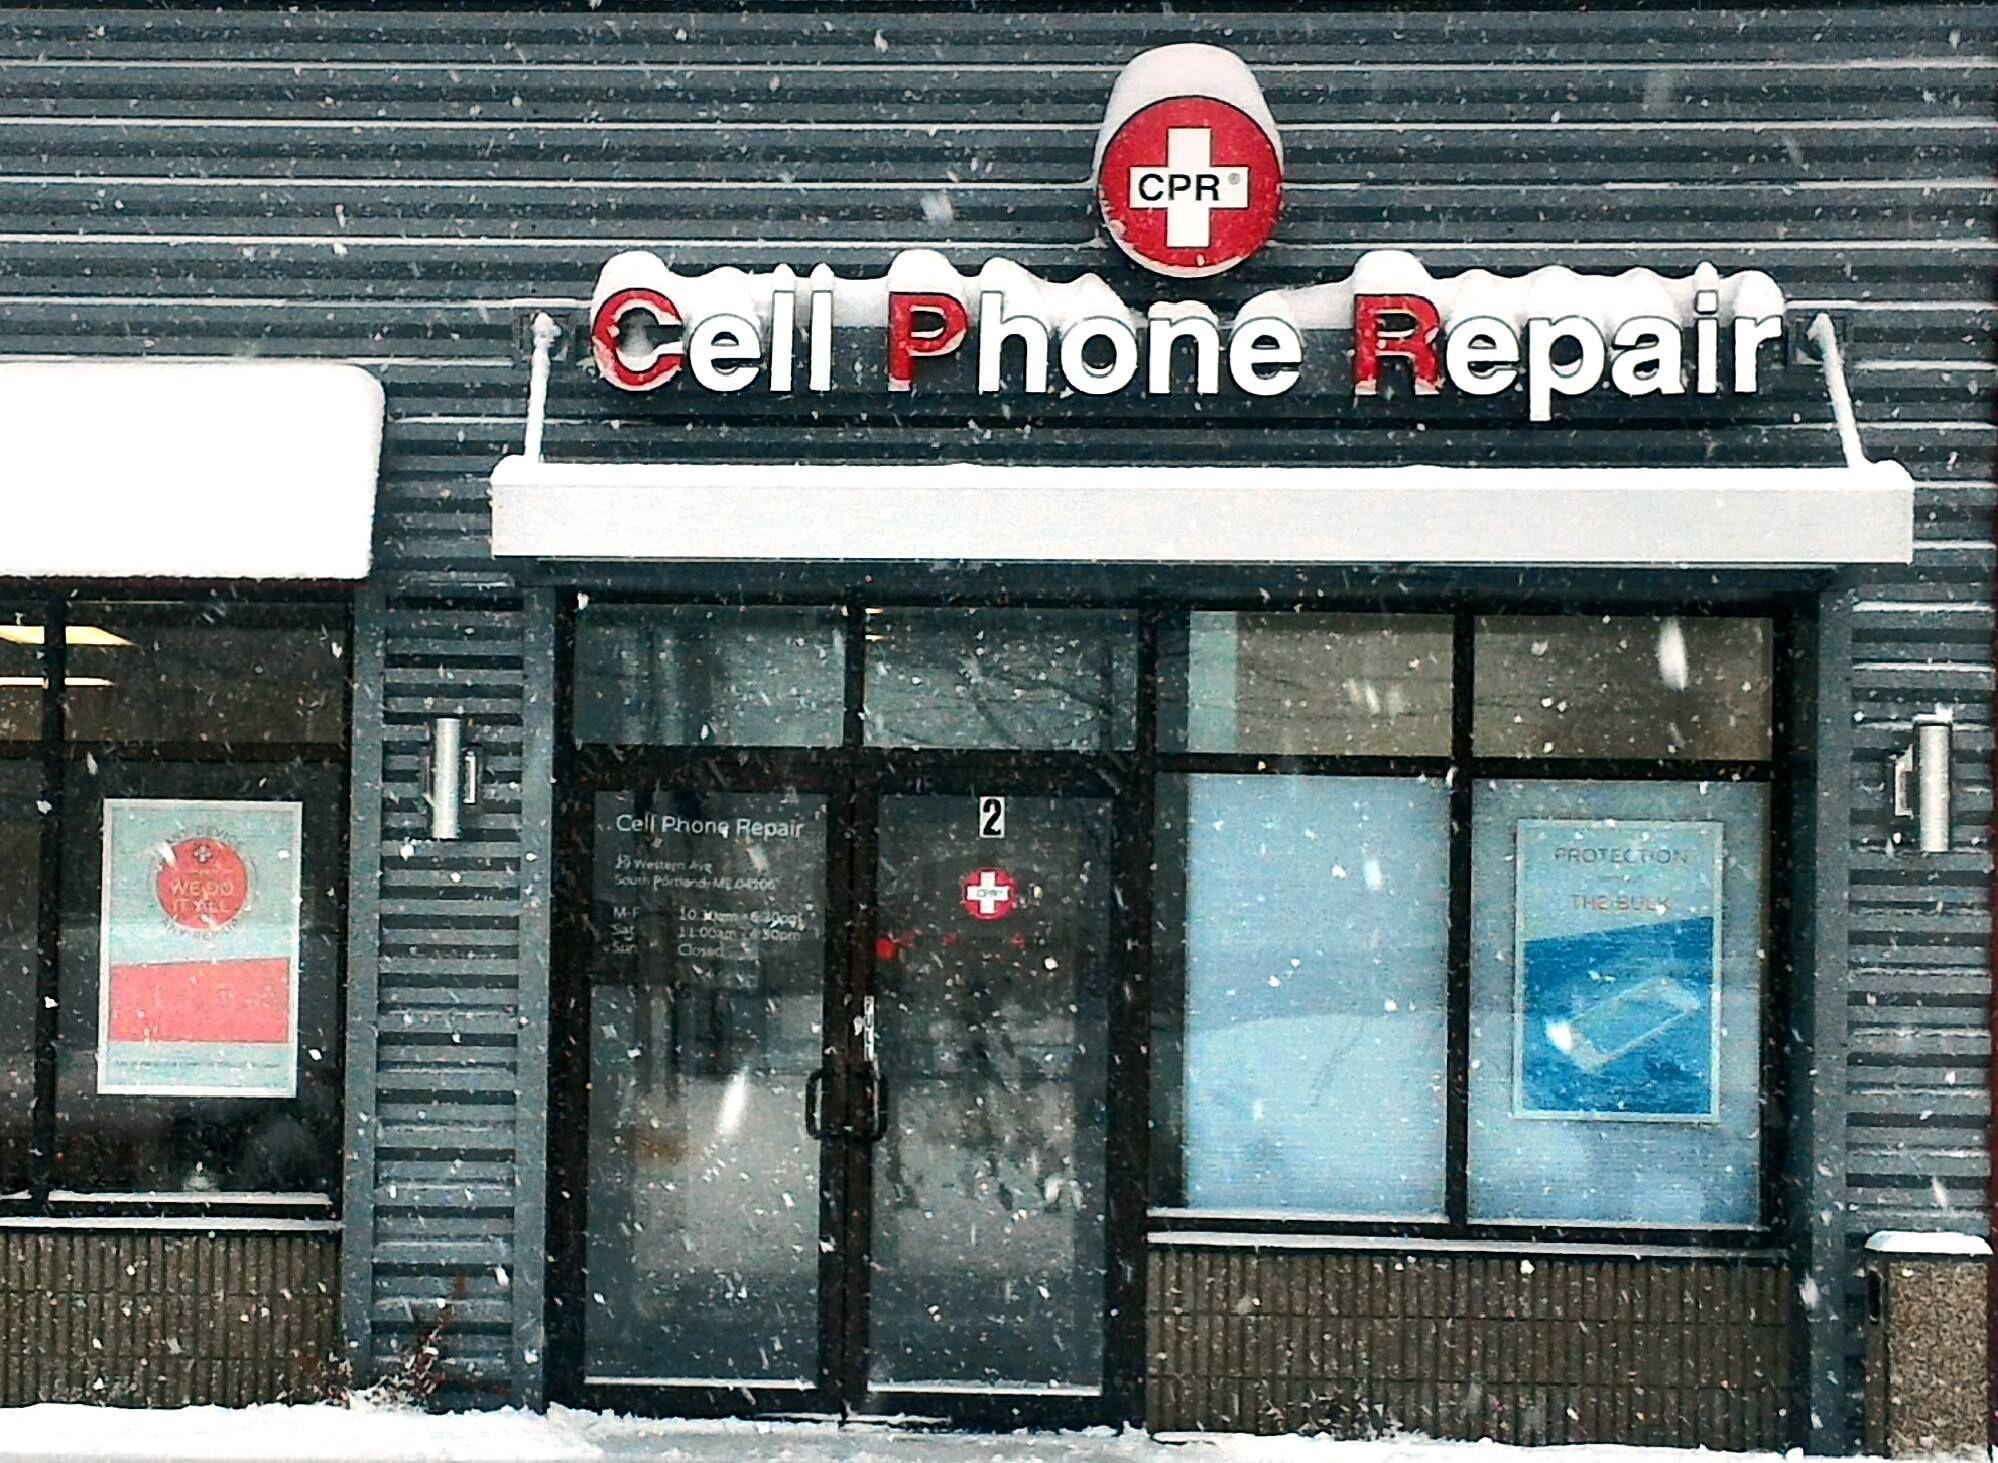 Maine Locations Phone, South portland, Laptop repair